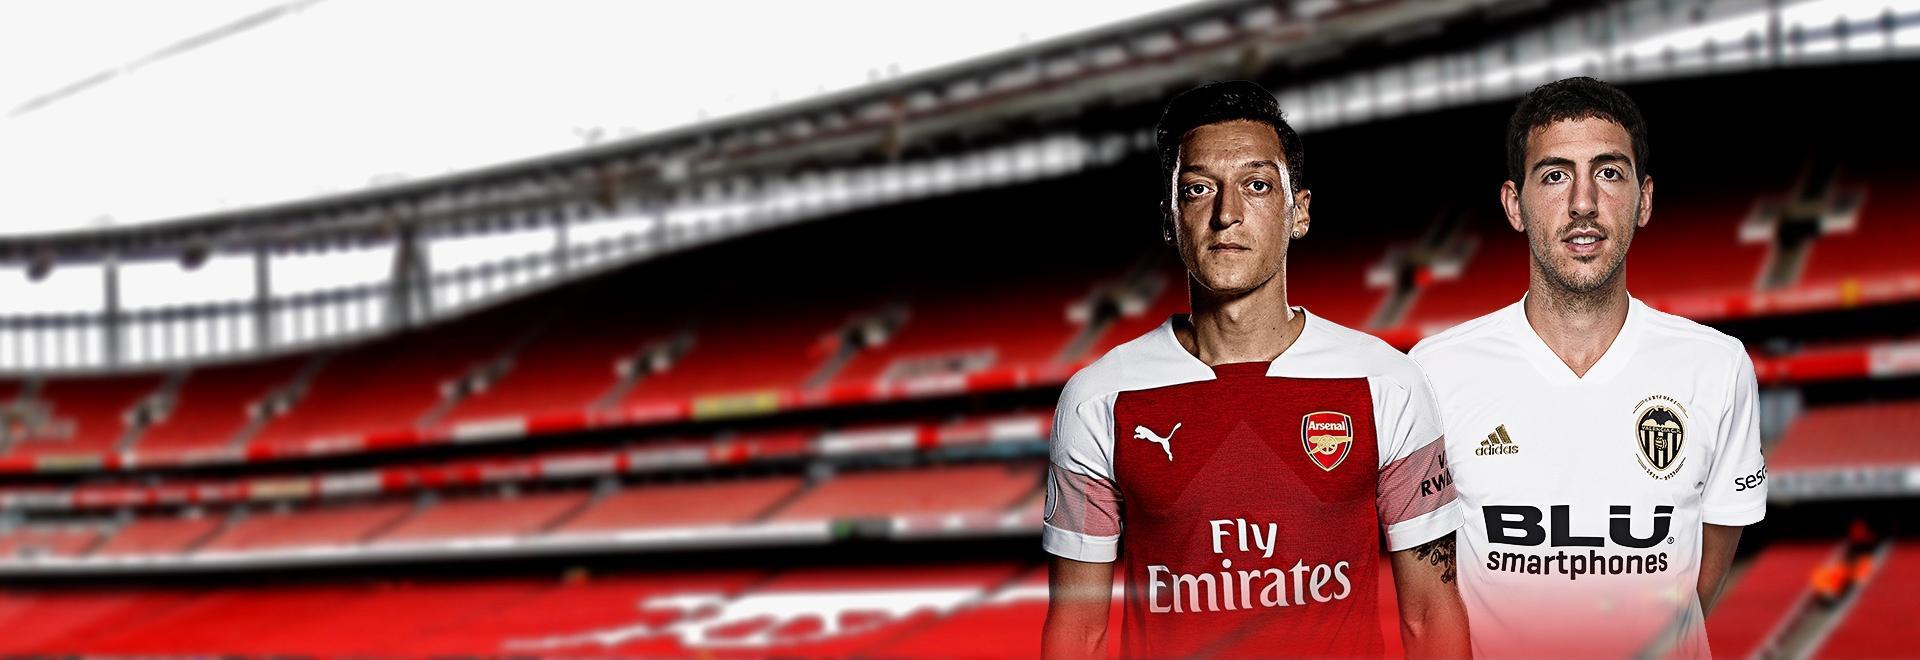 Arsenal - Valencia